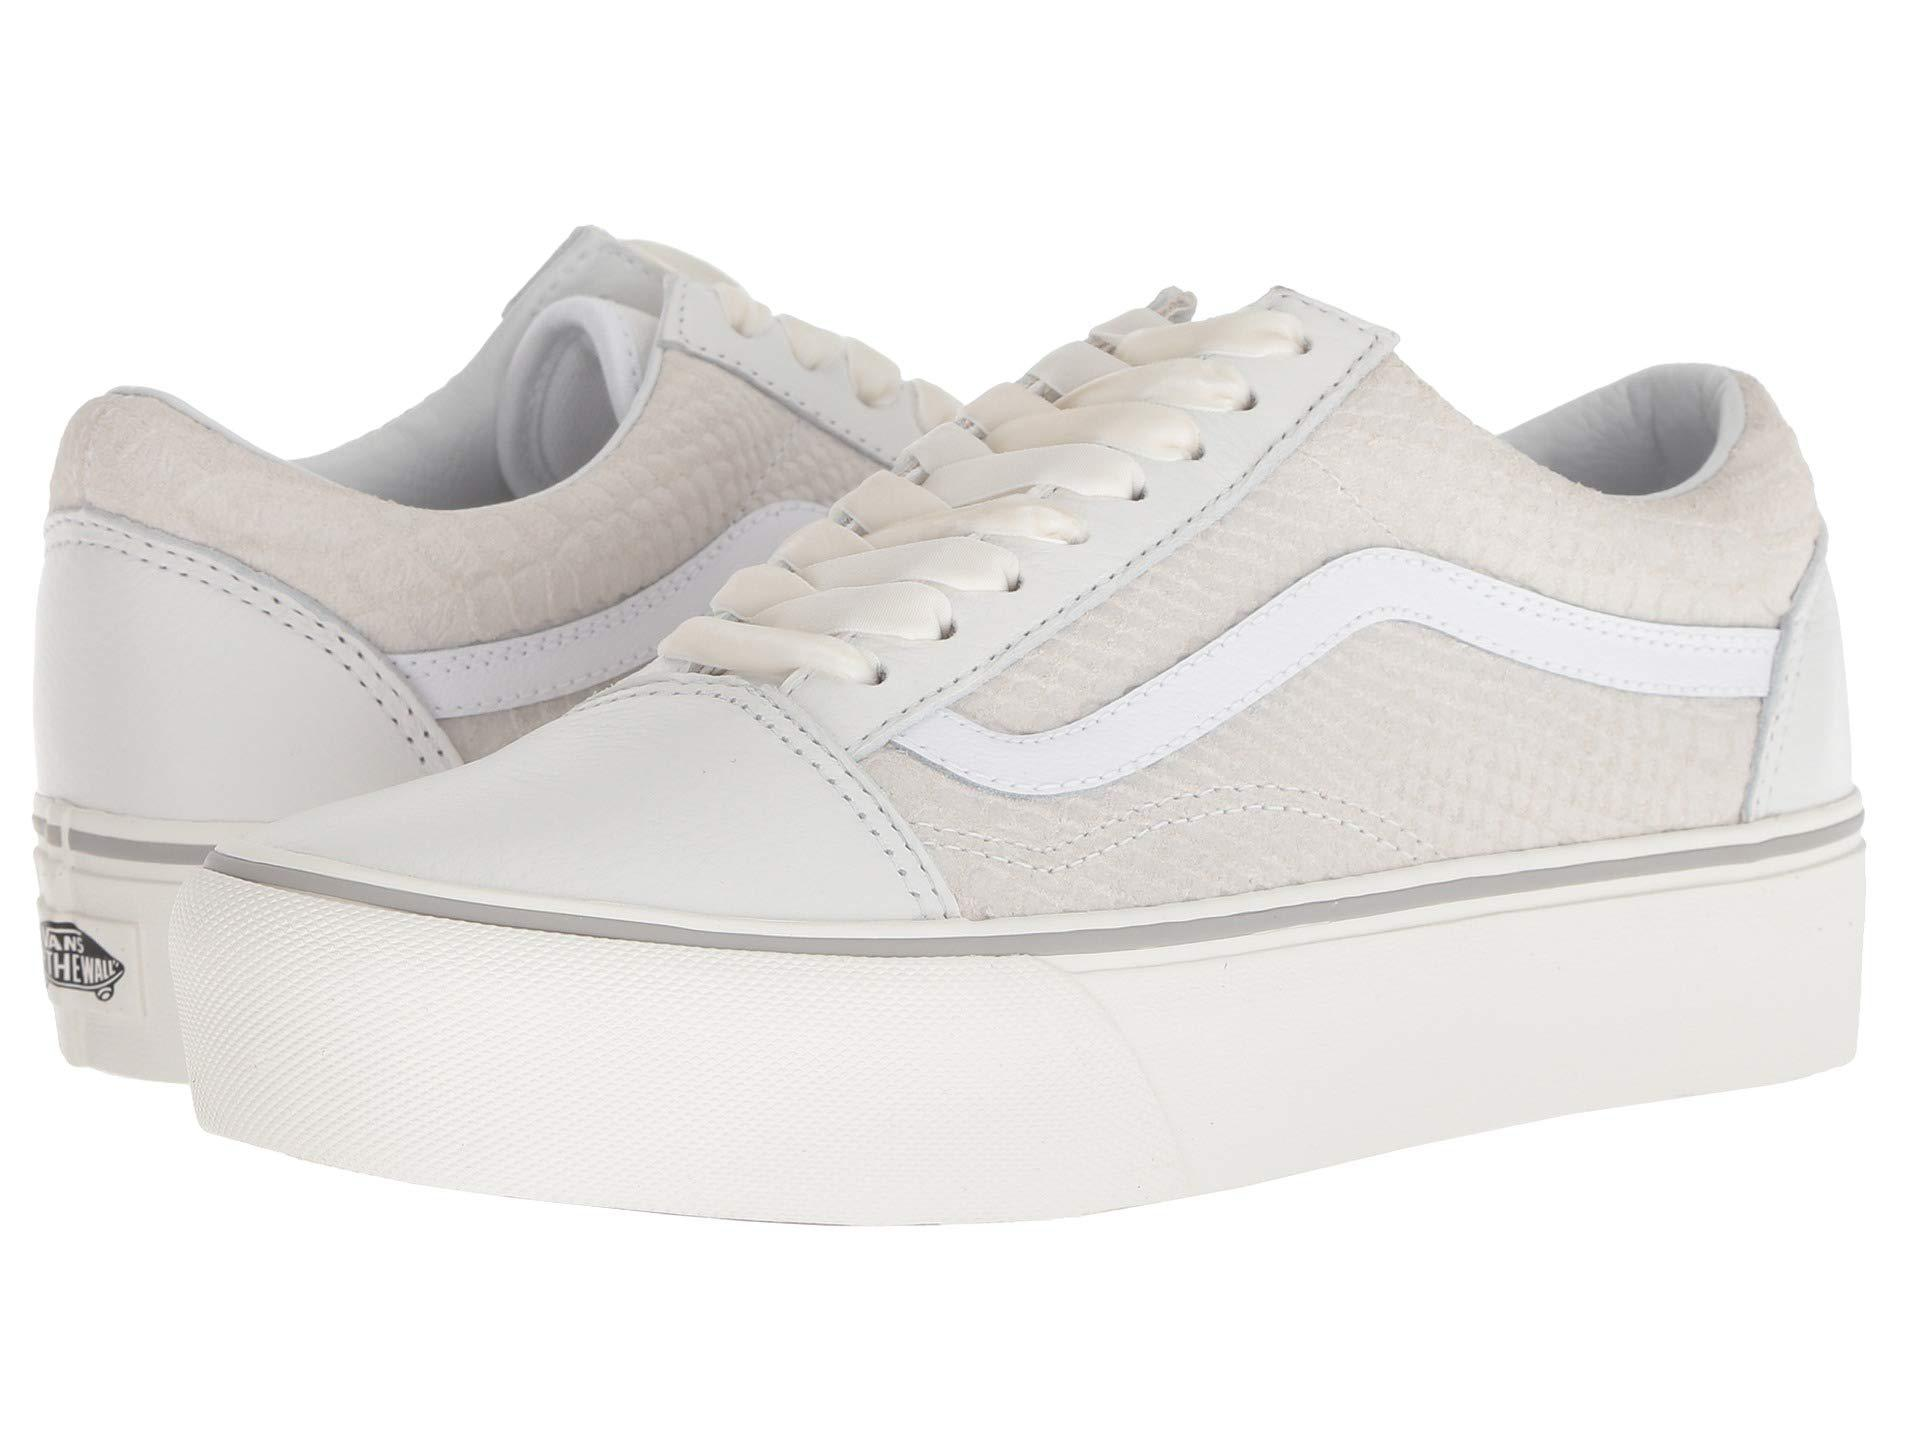 9c070d7e39d72c Lyst - Vans Old Skool Platform ((leather) Snake white) Skate Shoes ...